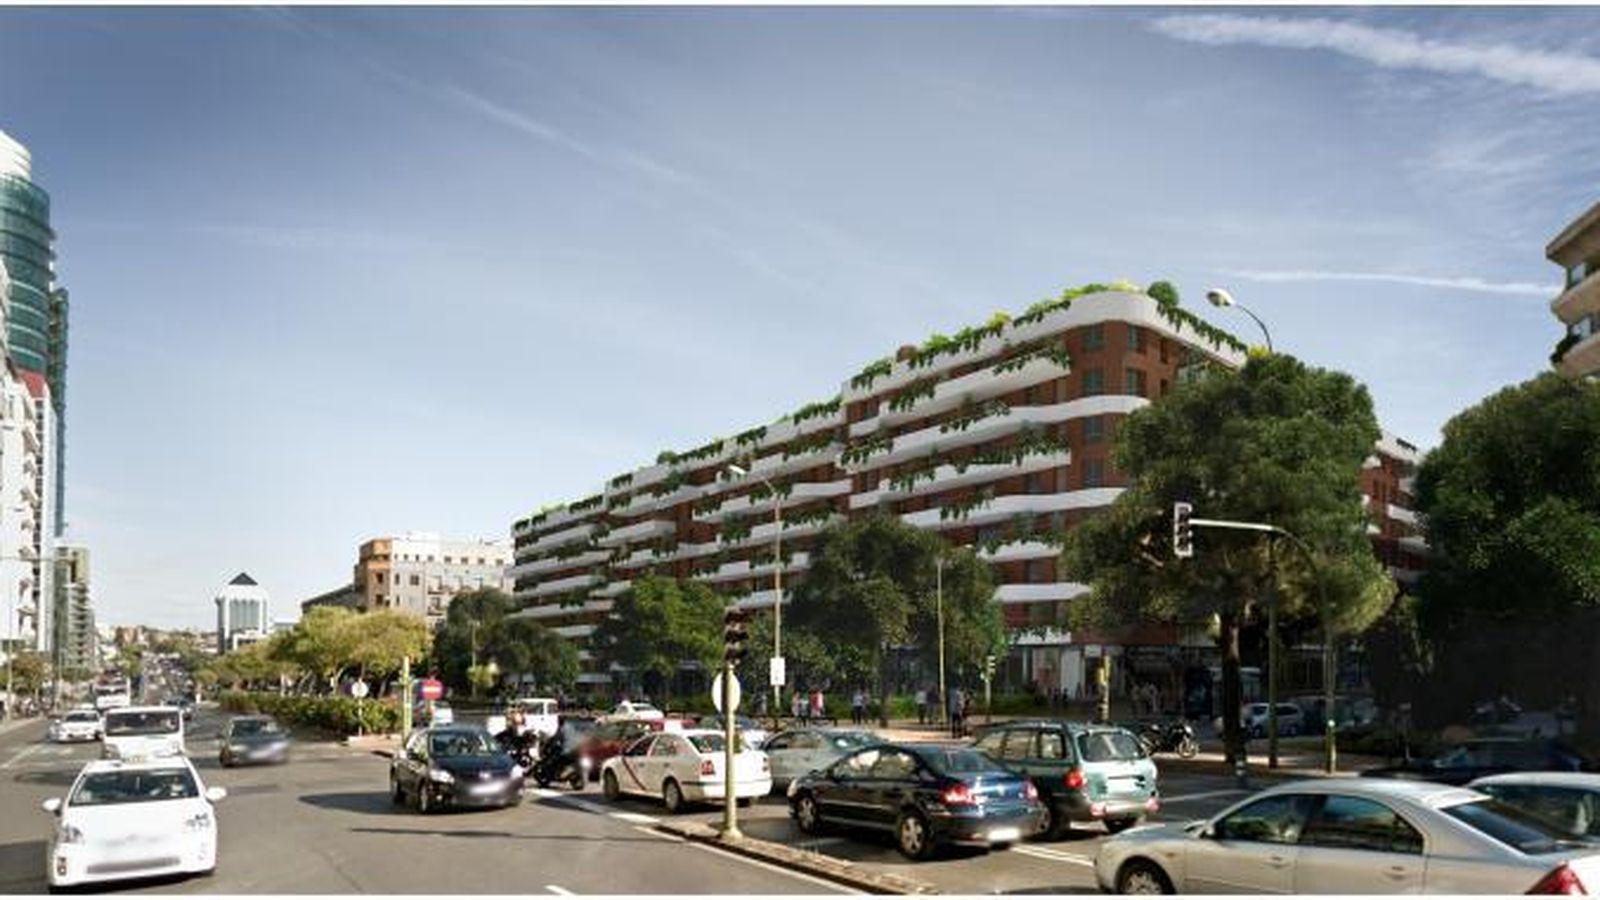 Foto: Infografía de las futuras viviendas de Raimundo Fernández Villaverde.